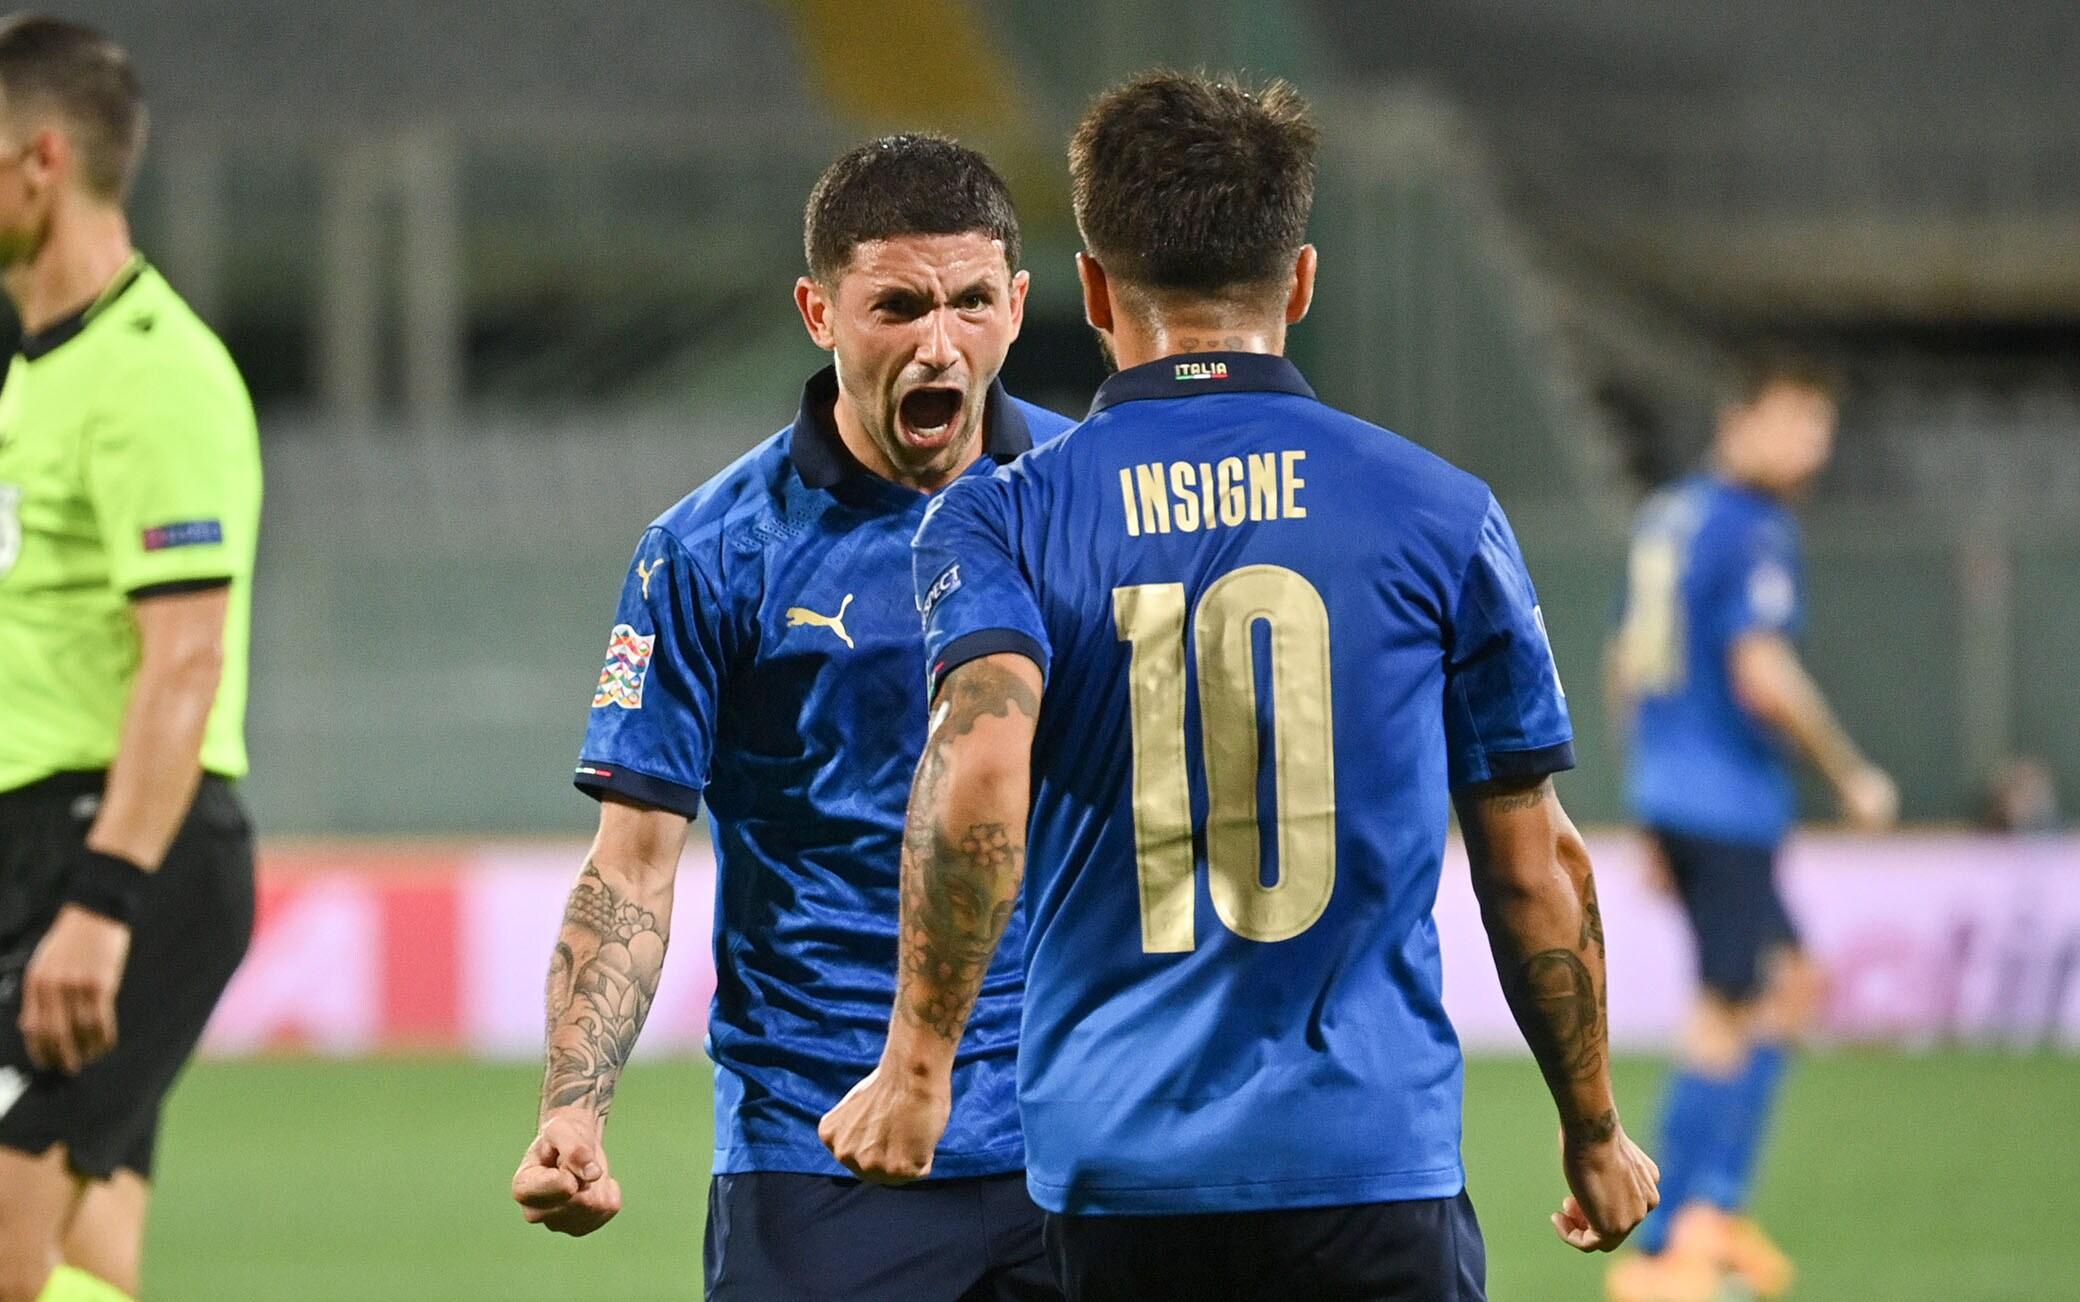 Italia Bosnia 1-1, gol di Dzeko e Sensi. Sfuma la 12^ vittoria di fila in  Nations League